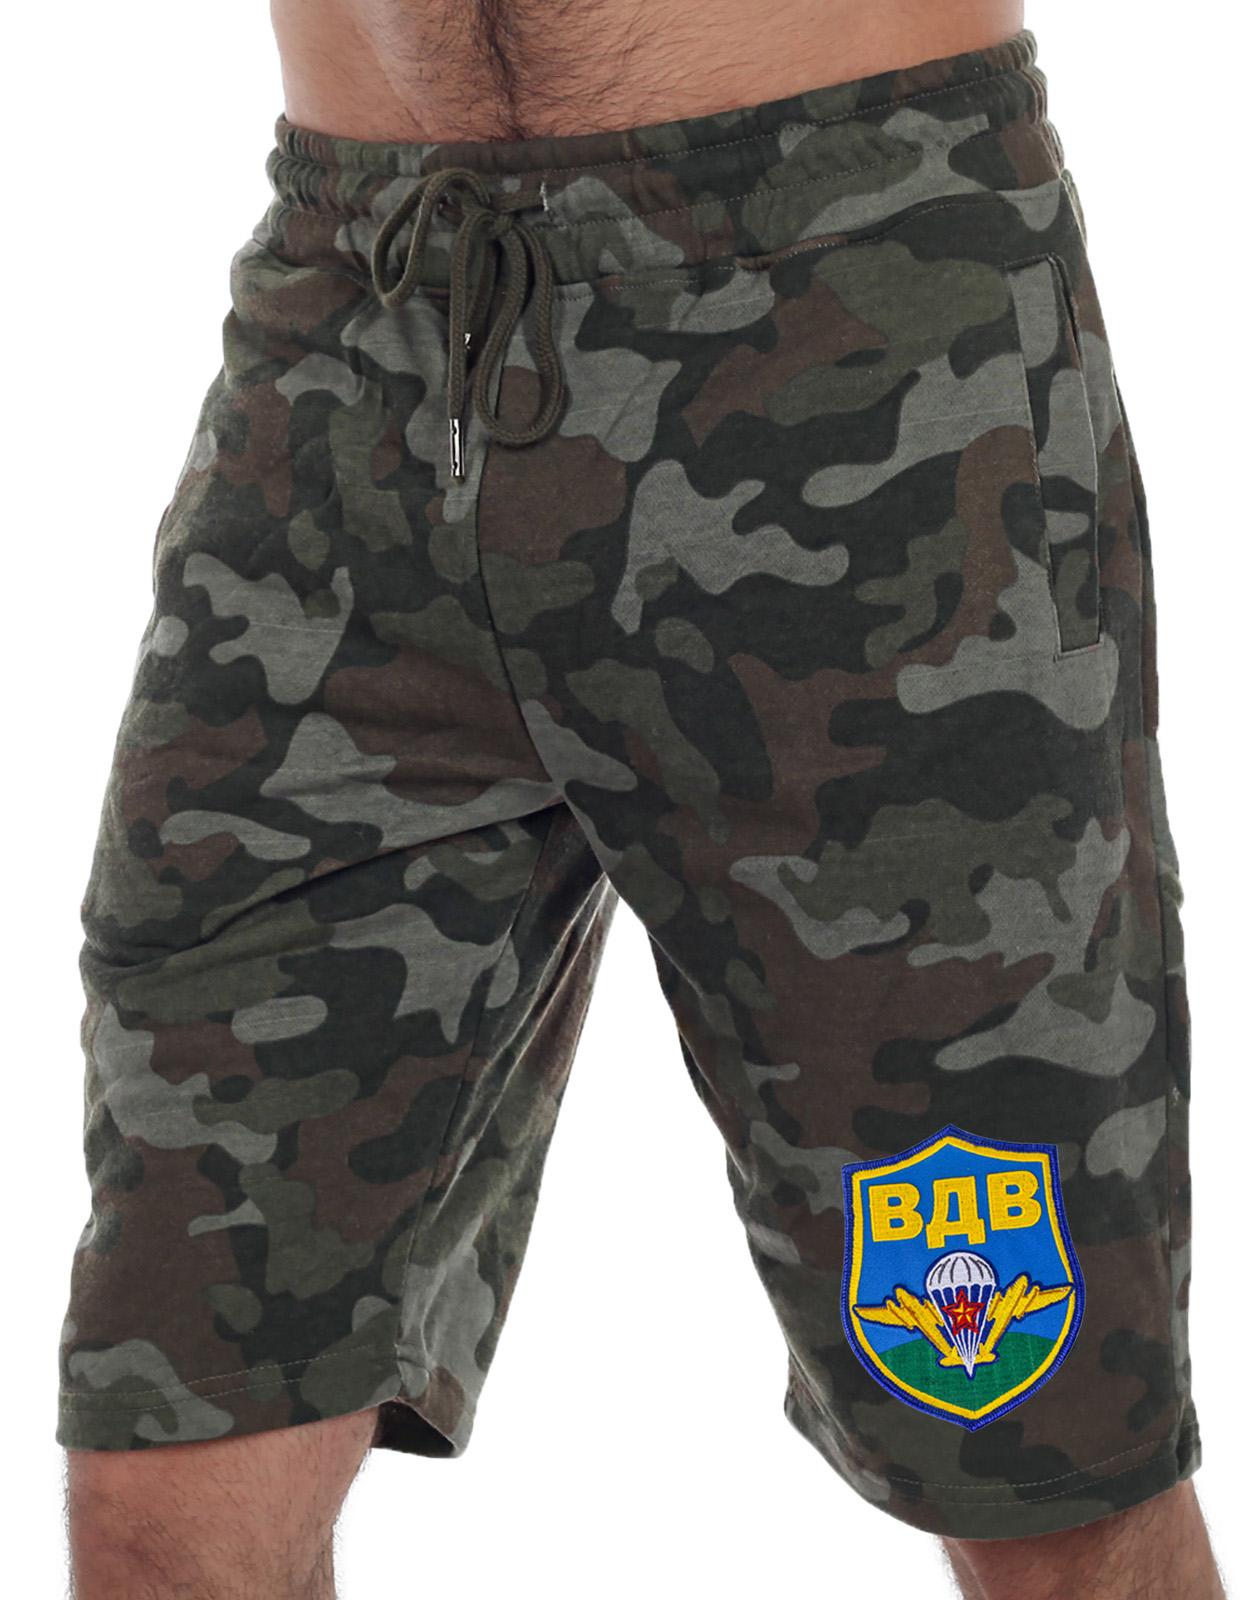 Общеармейские мужские шорты ВДВ от ТМ IZZUE